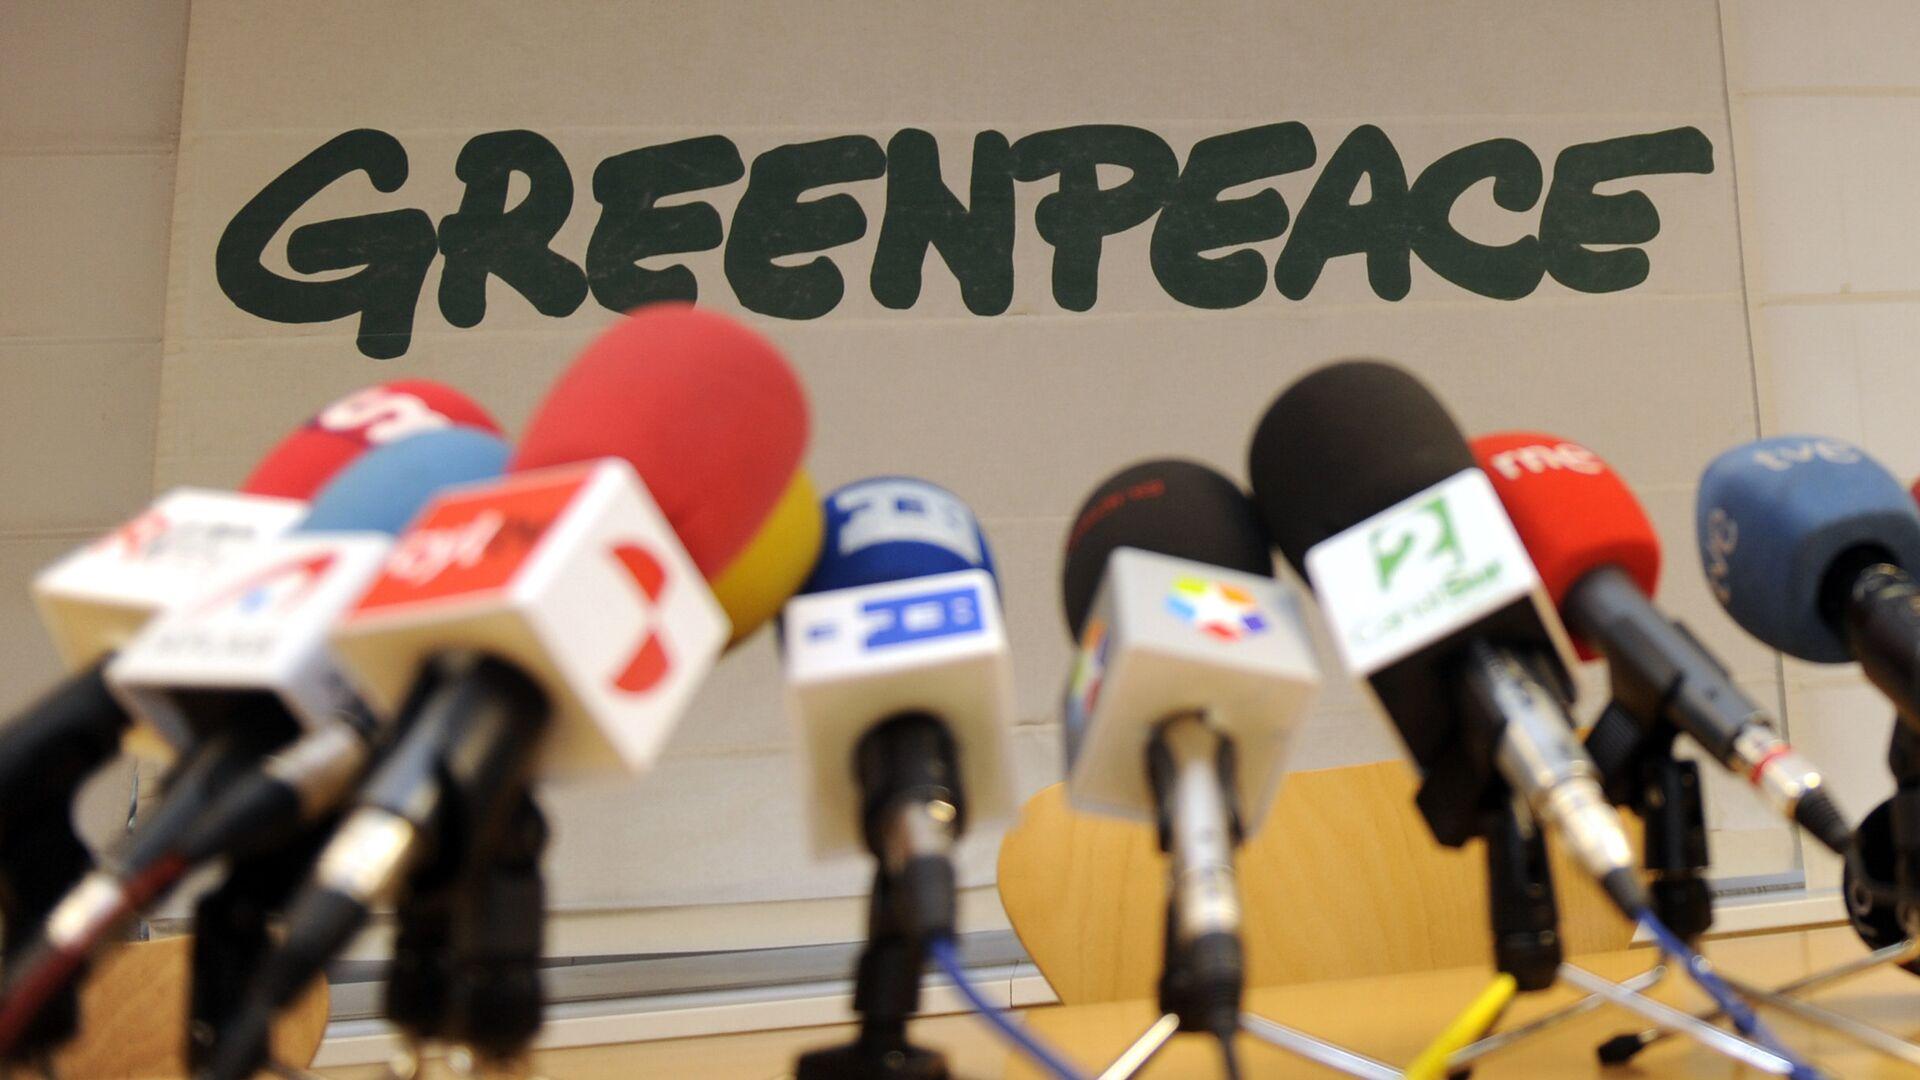 Logo de Greenpeace - Sputnik Mundo, 1920, 06.10.2021